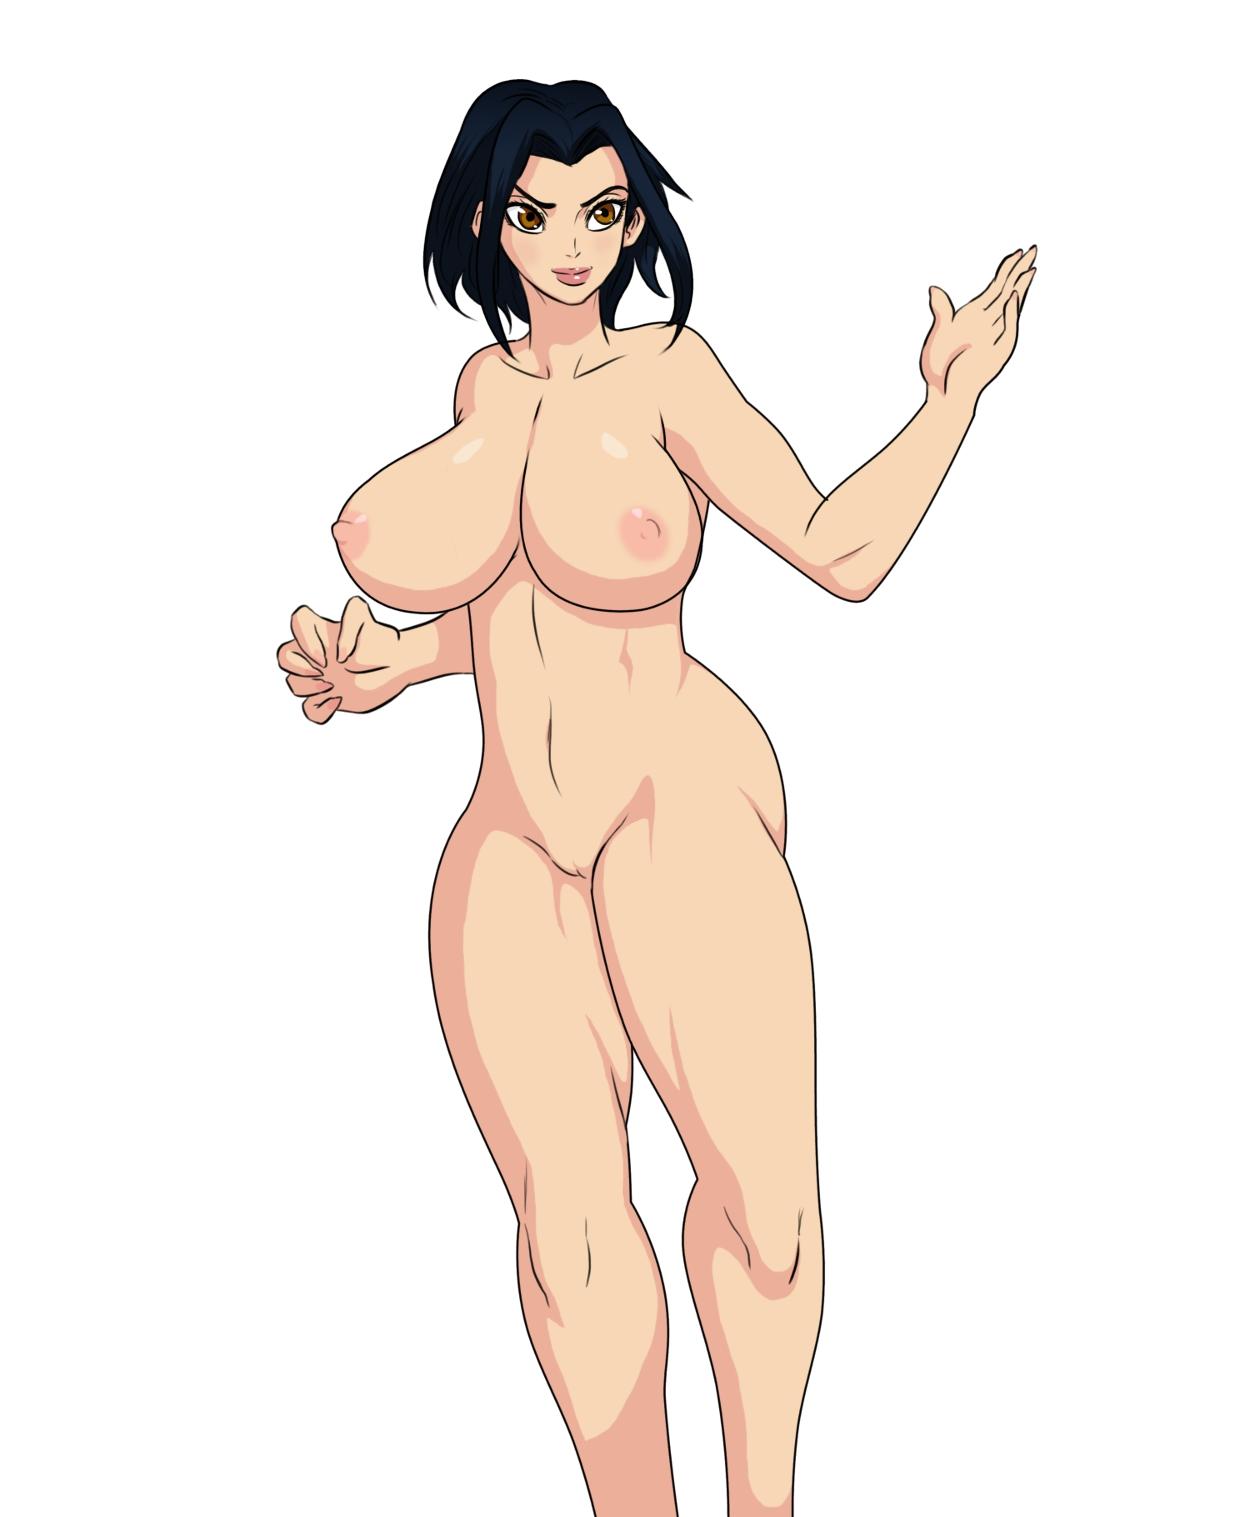 Jackie chan adventure cartoon jackie and hentai fucking